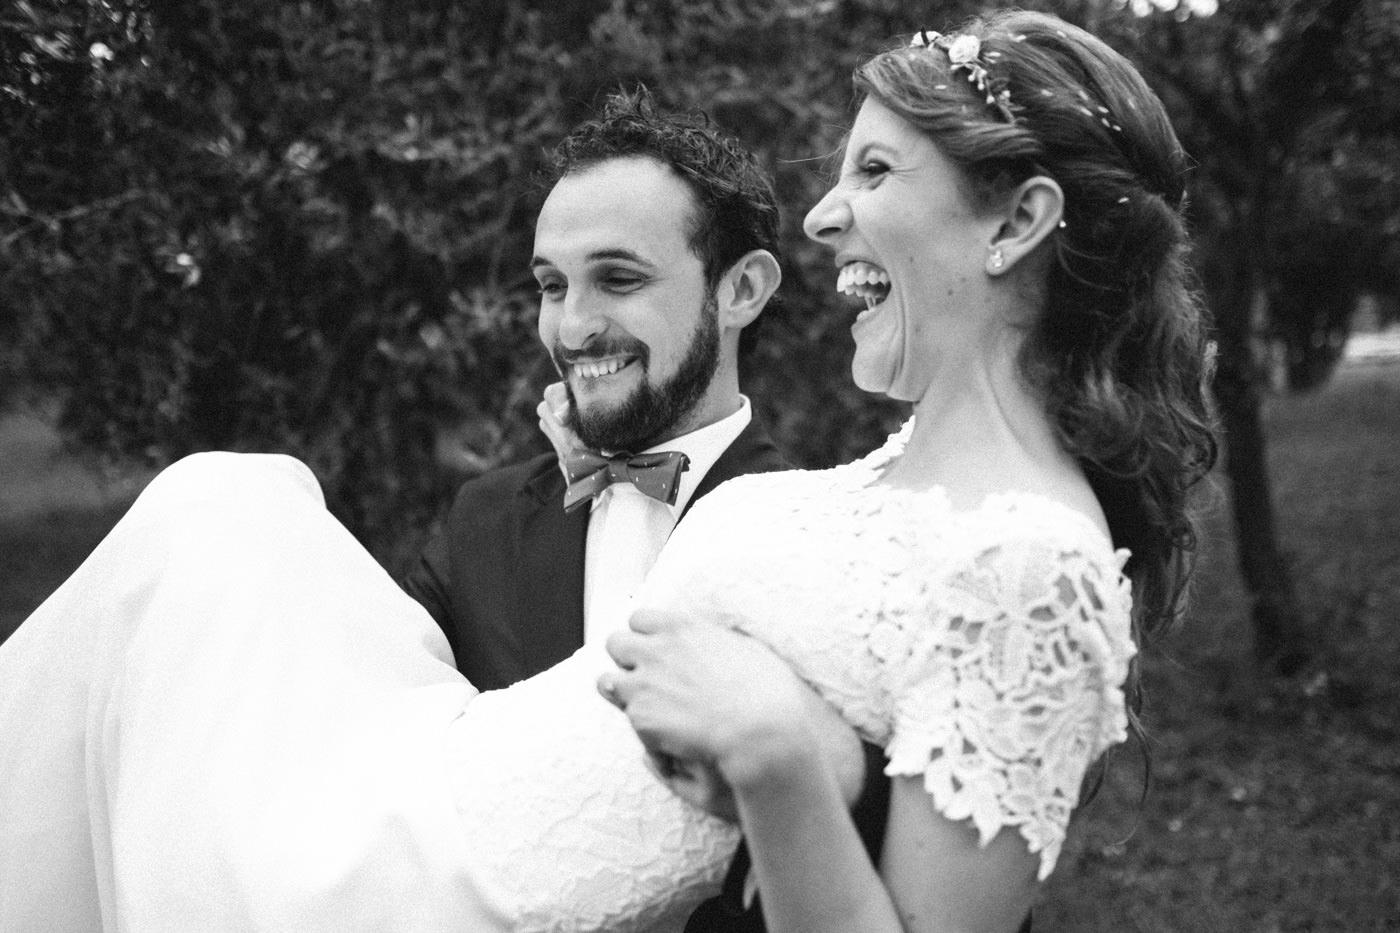 matrimoni_all_italiana_fotografo_matrimonio_toscana-60.jpg